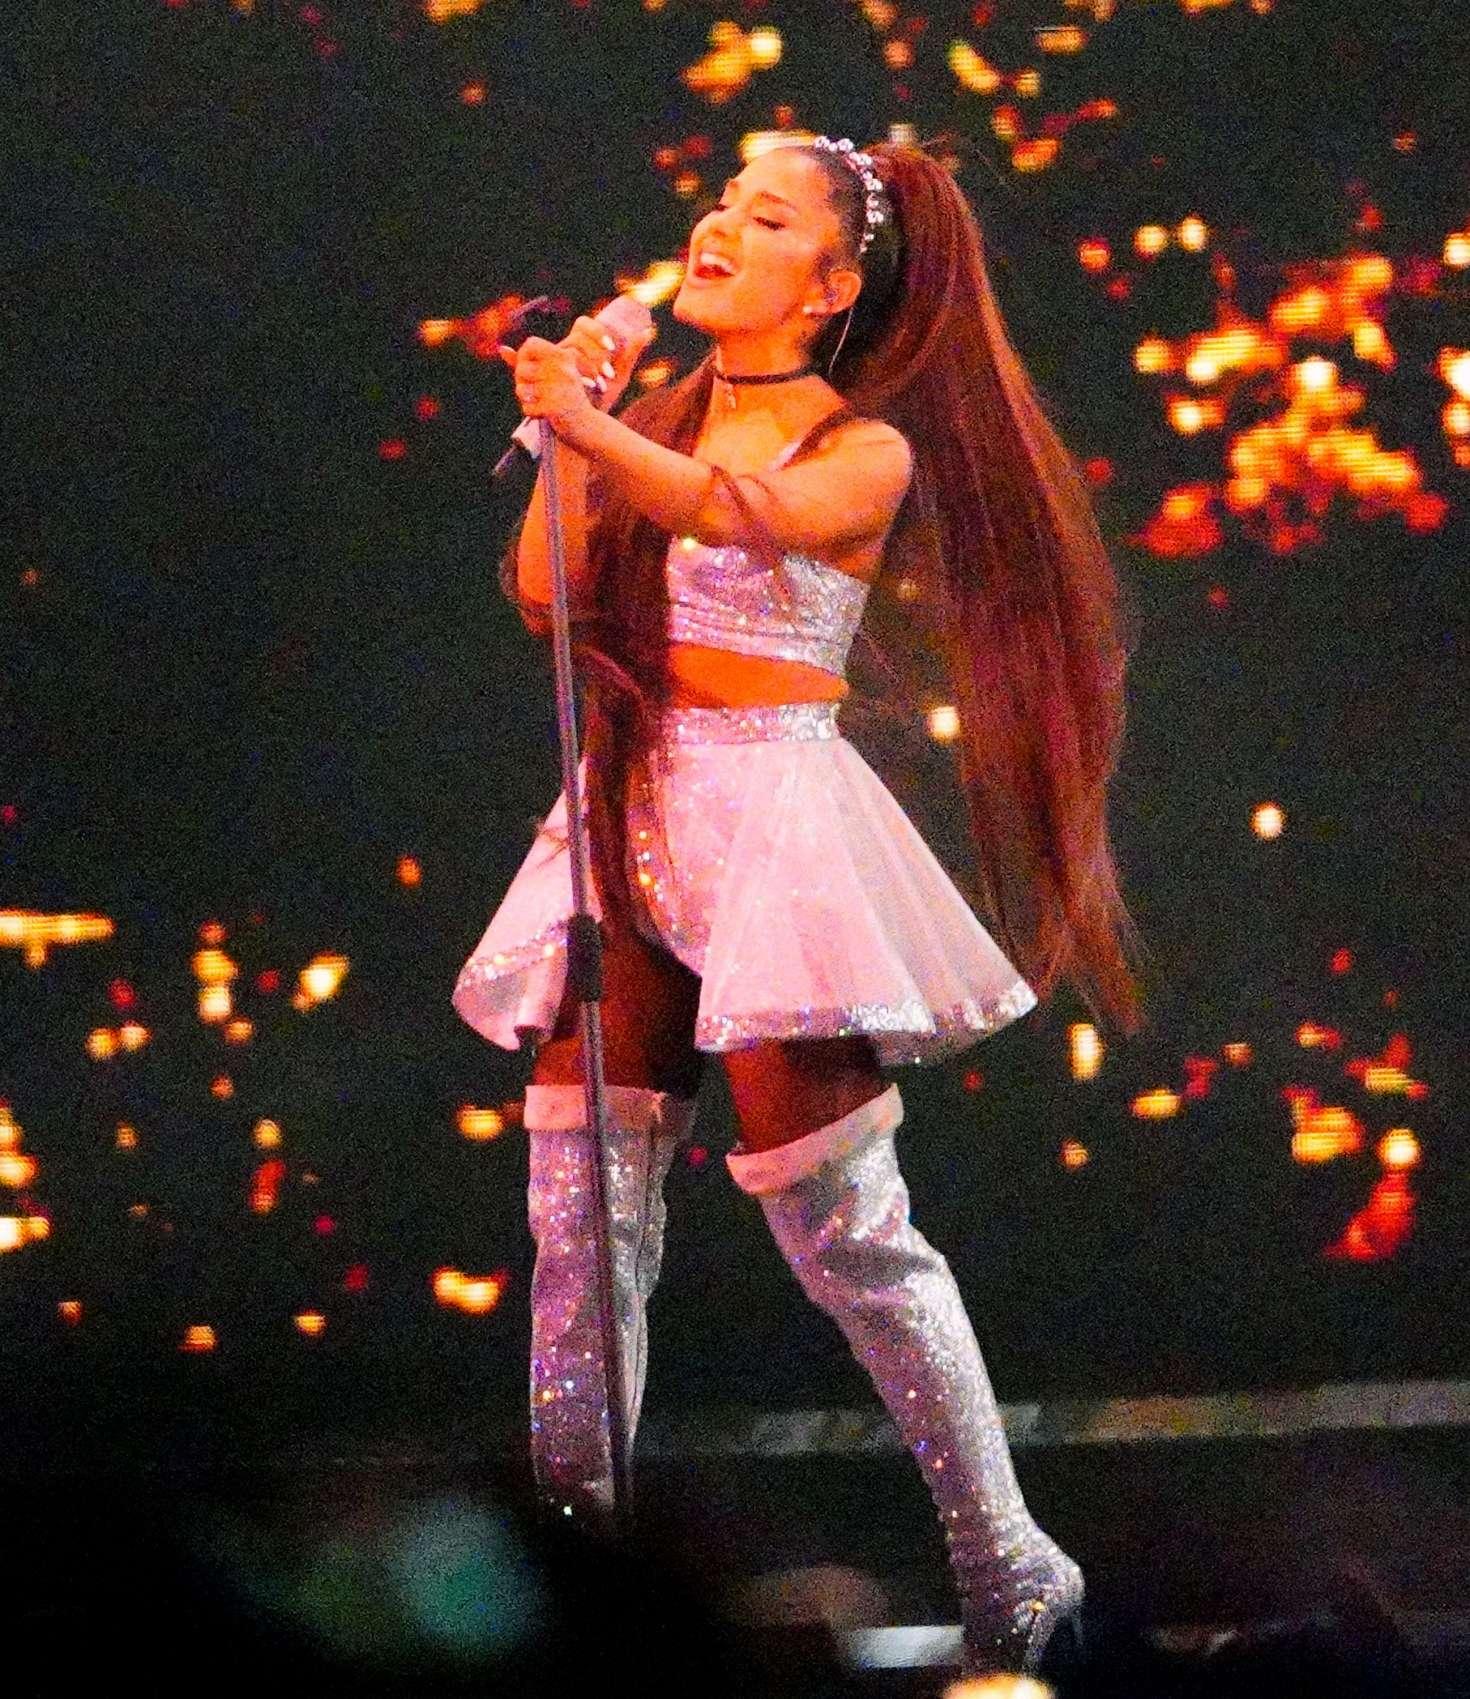 Ariana Grande 2019 : Ariana Grande: Performance at Coachella -21